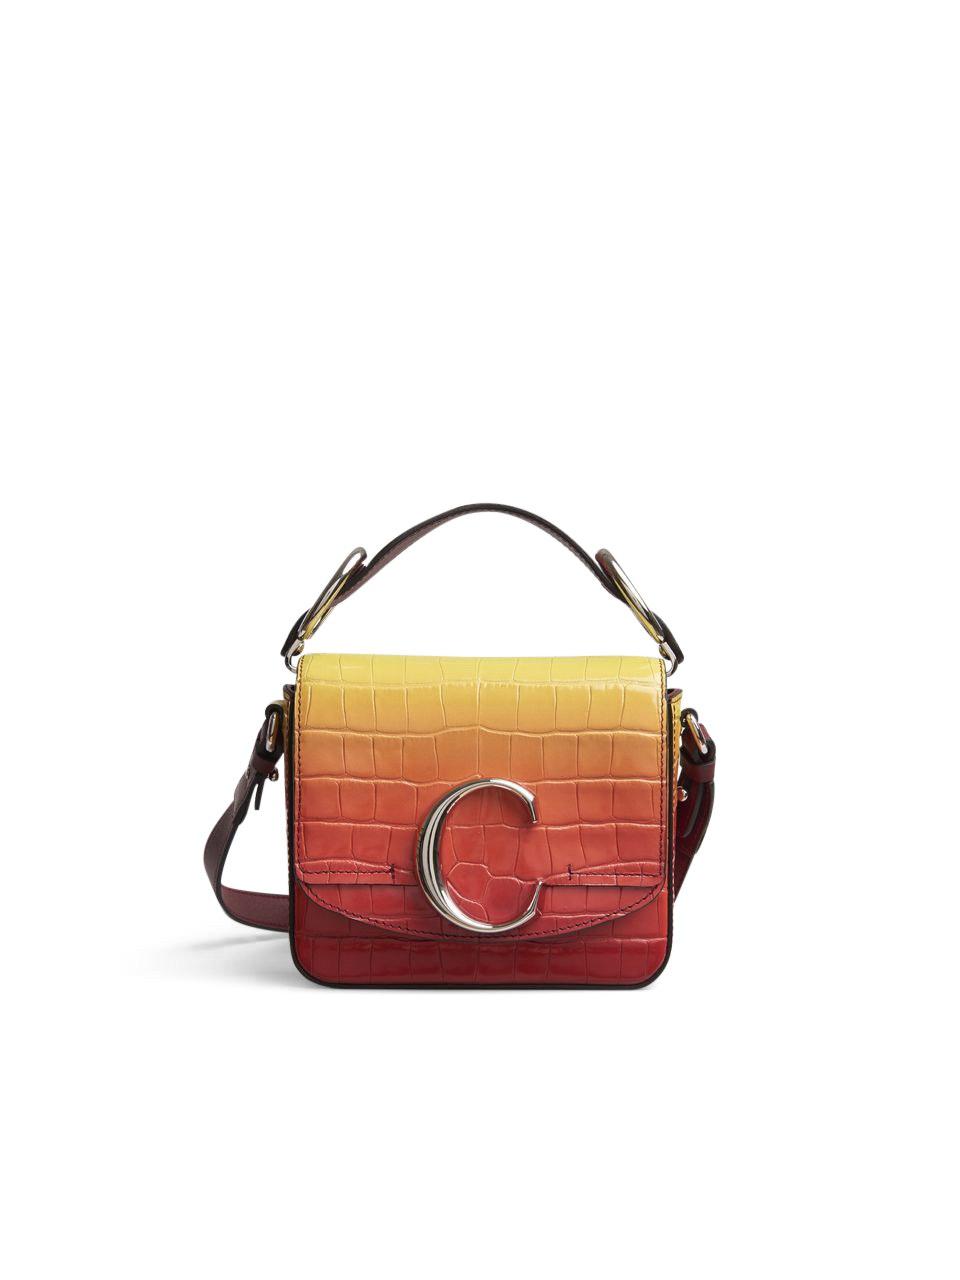 Chloe C Croco Mini Yellow/Red